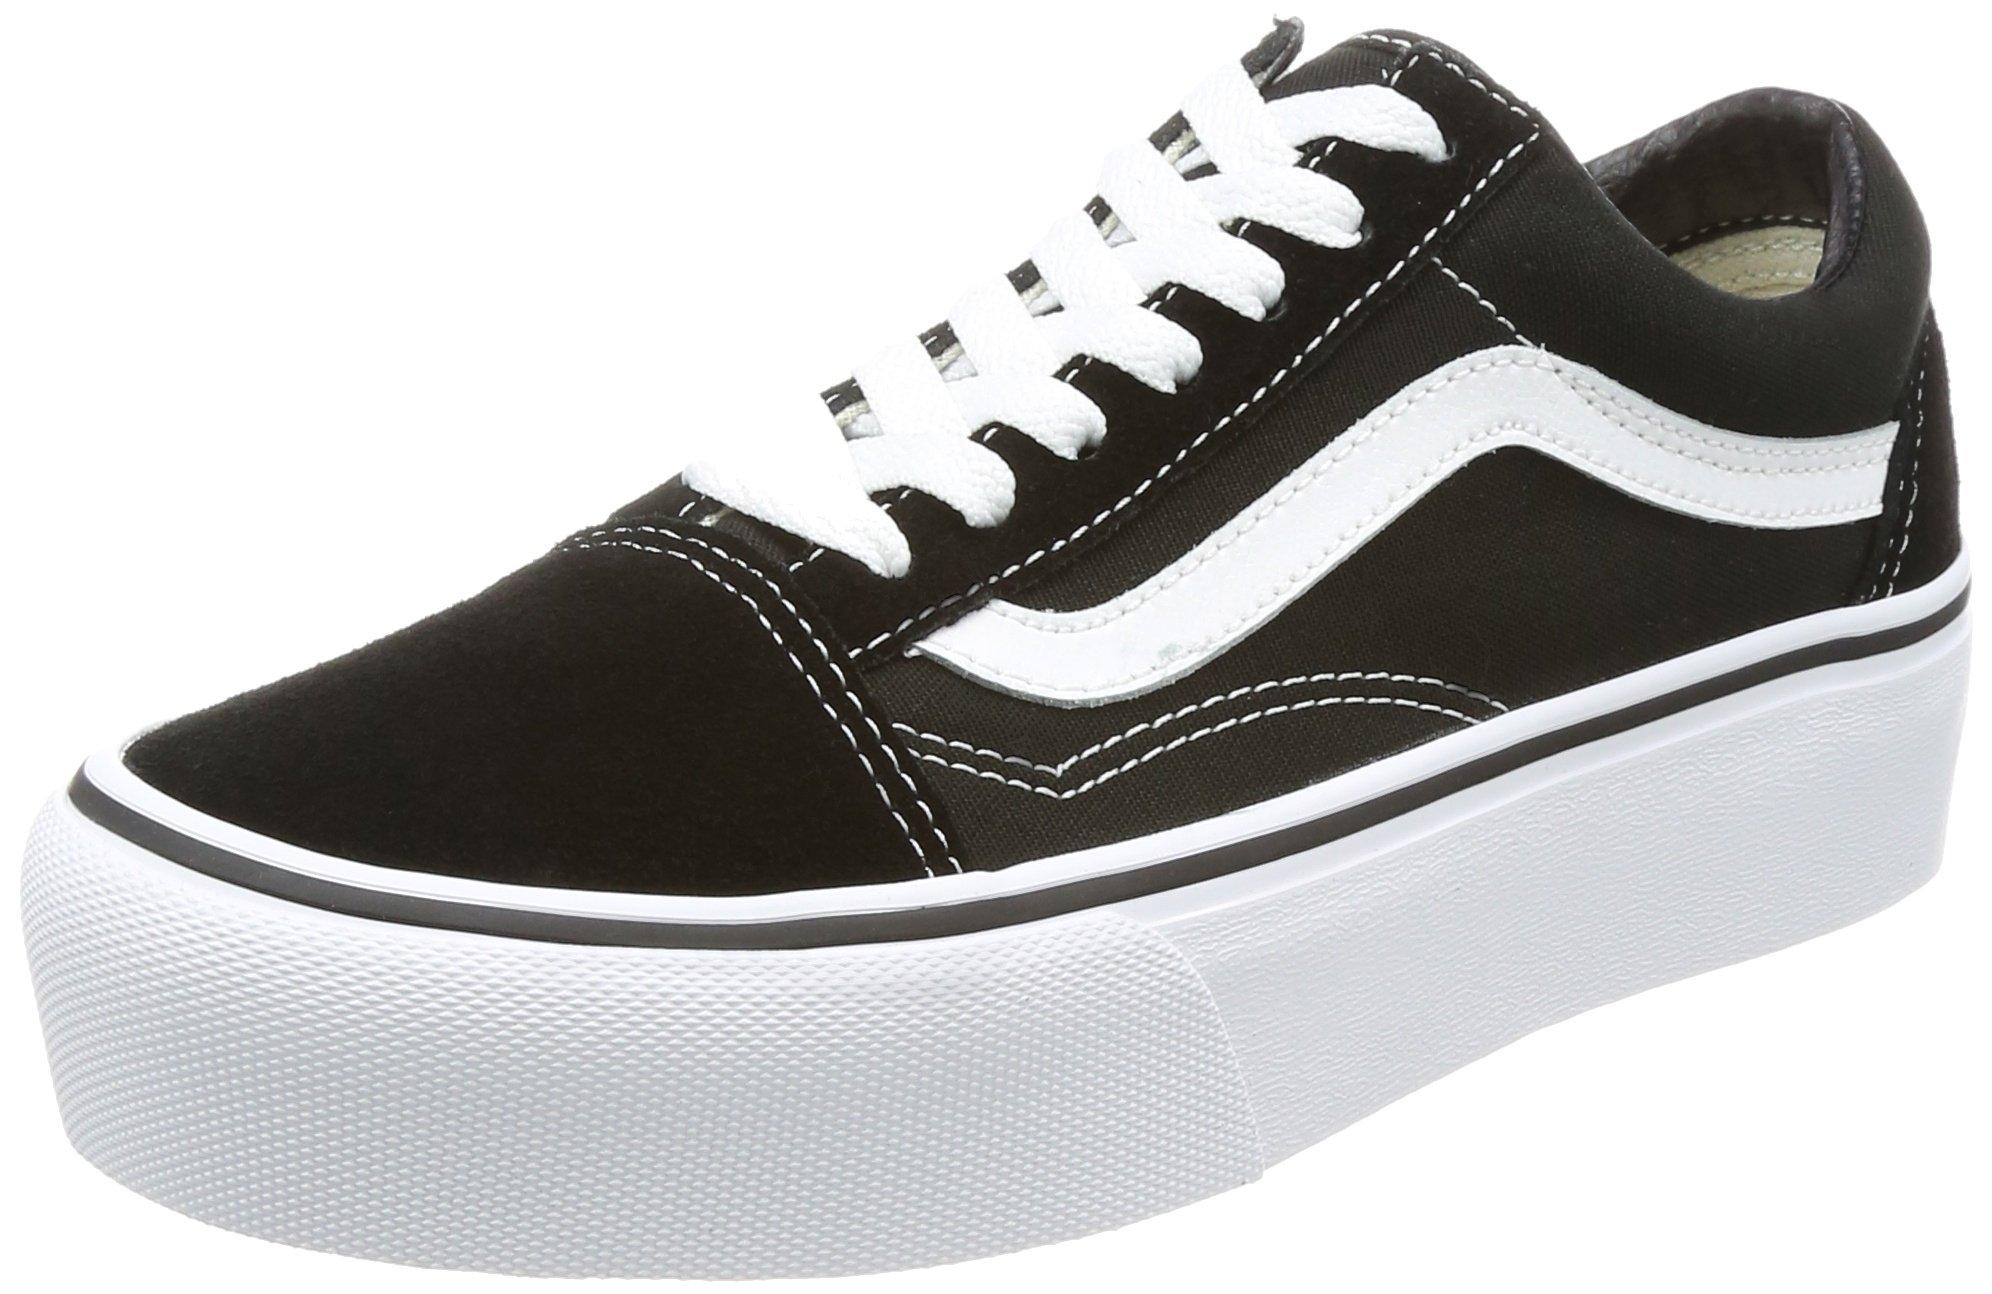 f61cf69240 Galleon - Vans Shoes Woman Low Sneakers VN0A3B3UY28 Old Skool Platform Size  37 Black White